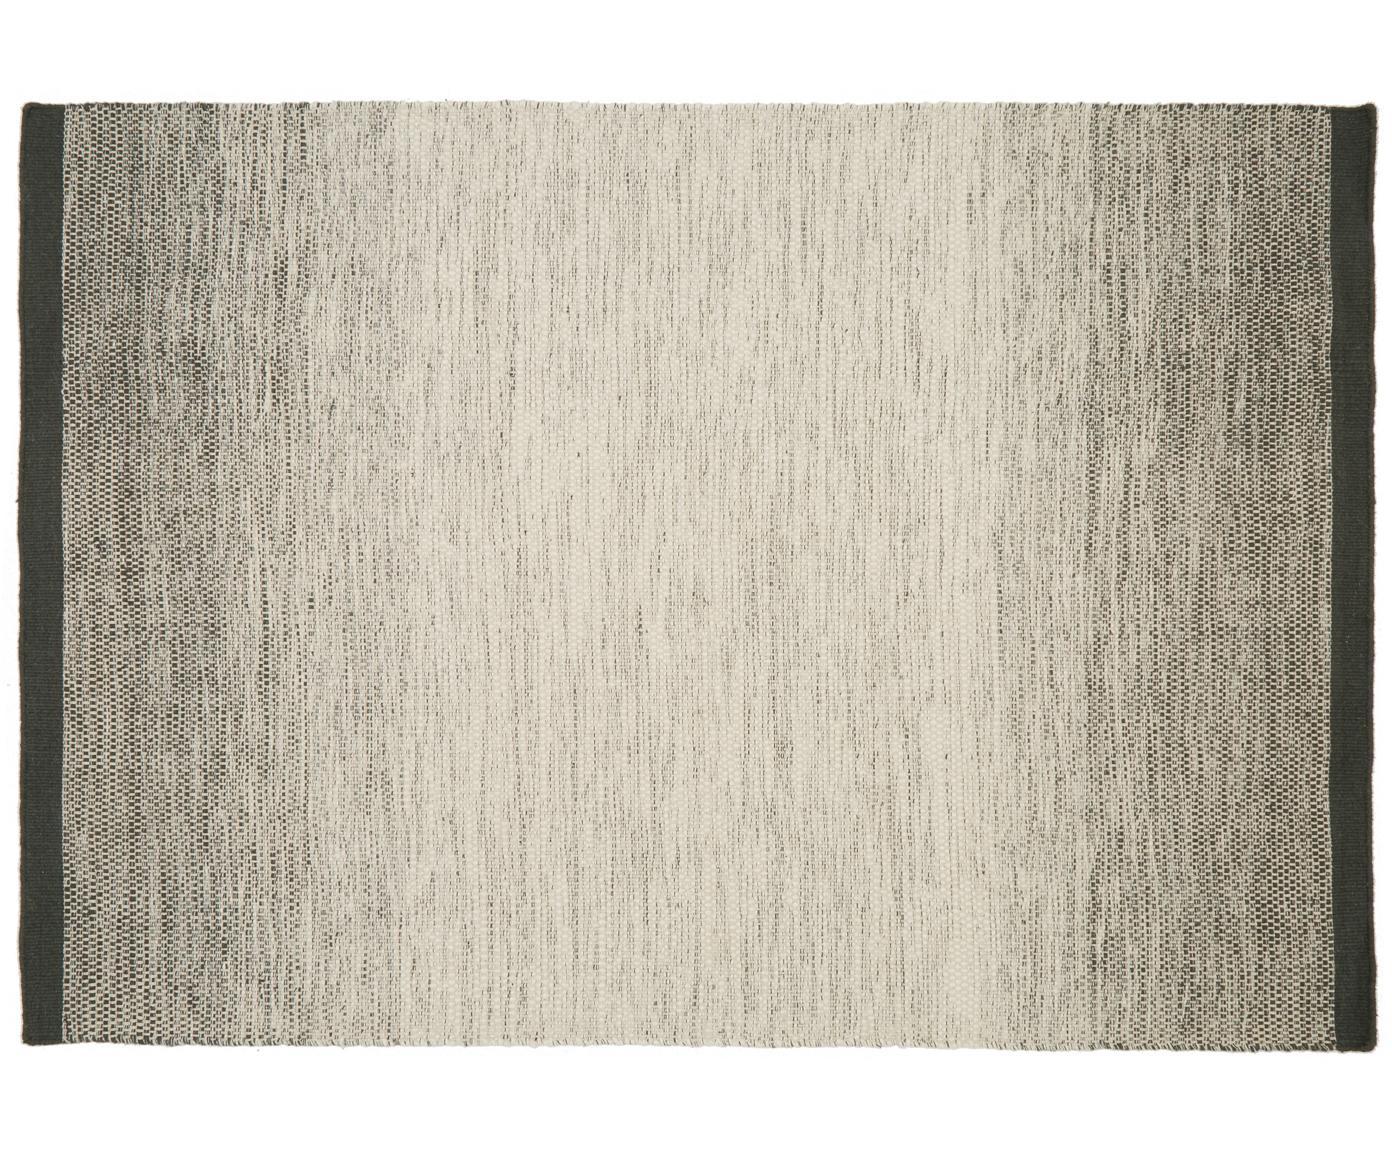 Tappeto in lana tessuto a mano Lule, 70% lana, 30% cotone, Verde scuro, beige, Larg. 140 x Lung. 200 cm (taglia S)